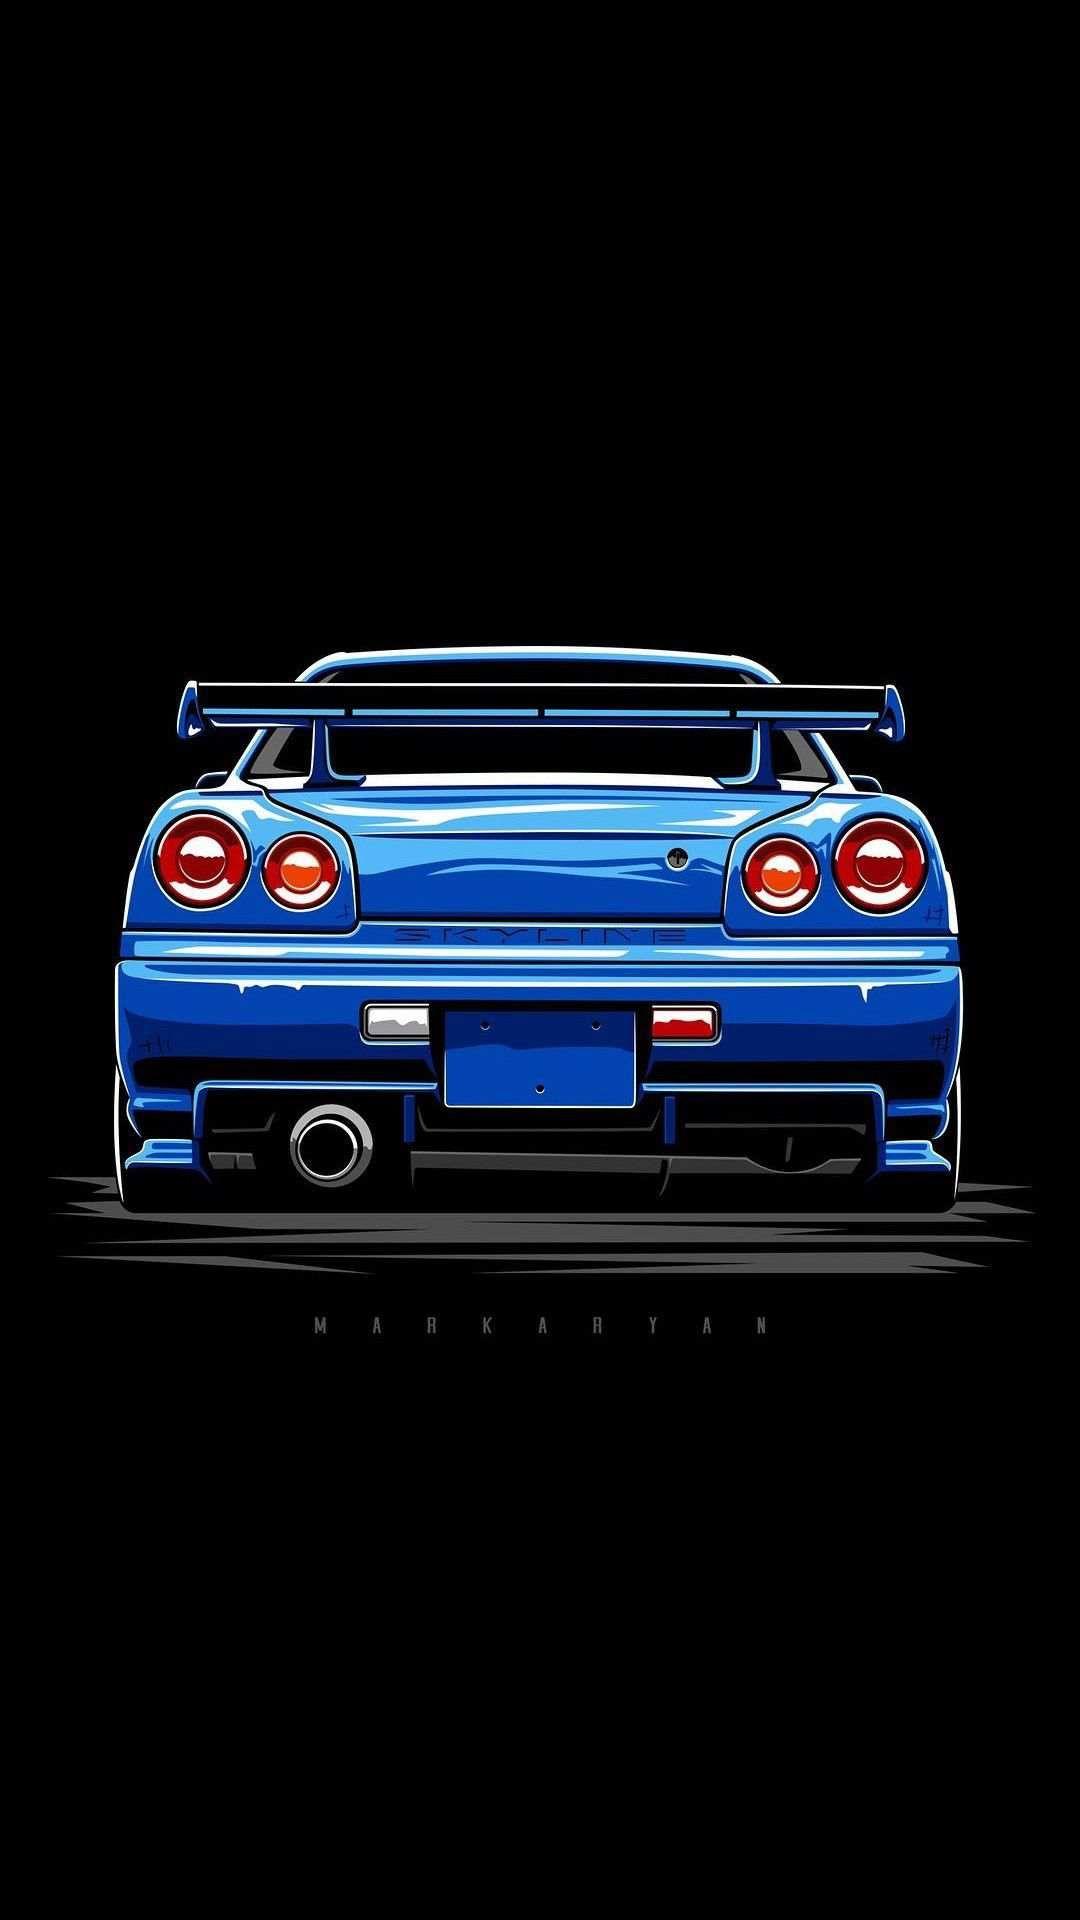 Nissan Skyline Blue Wallpaper Nissan Skyline Skyline Gtr R34 Nissan Gtr Skyline